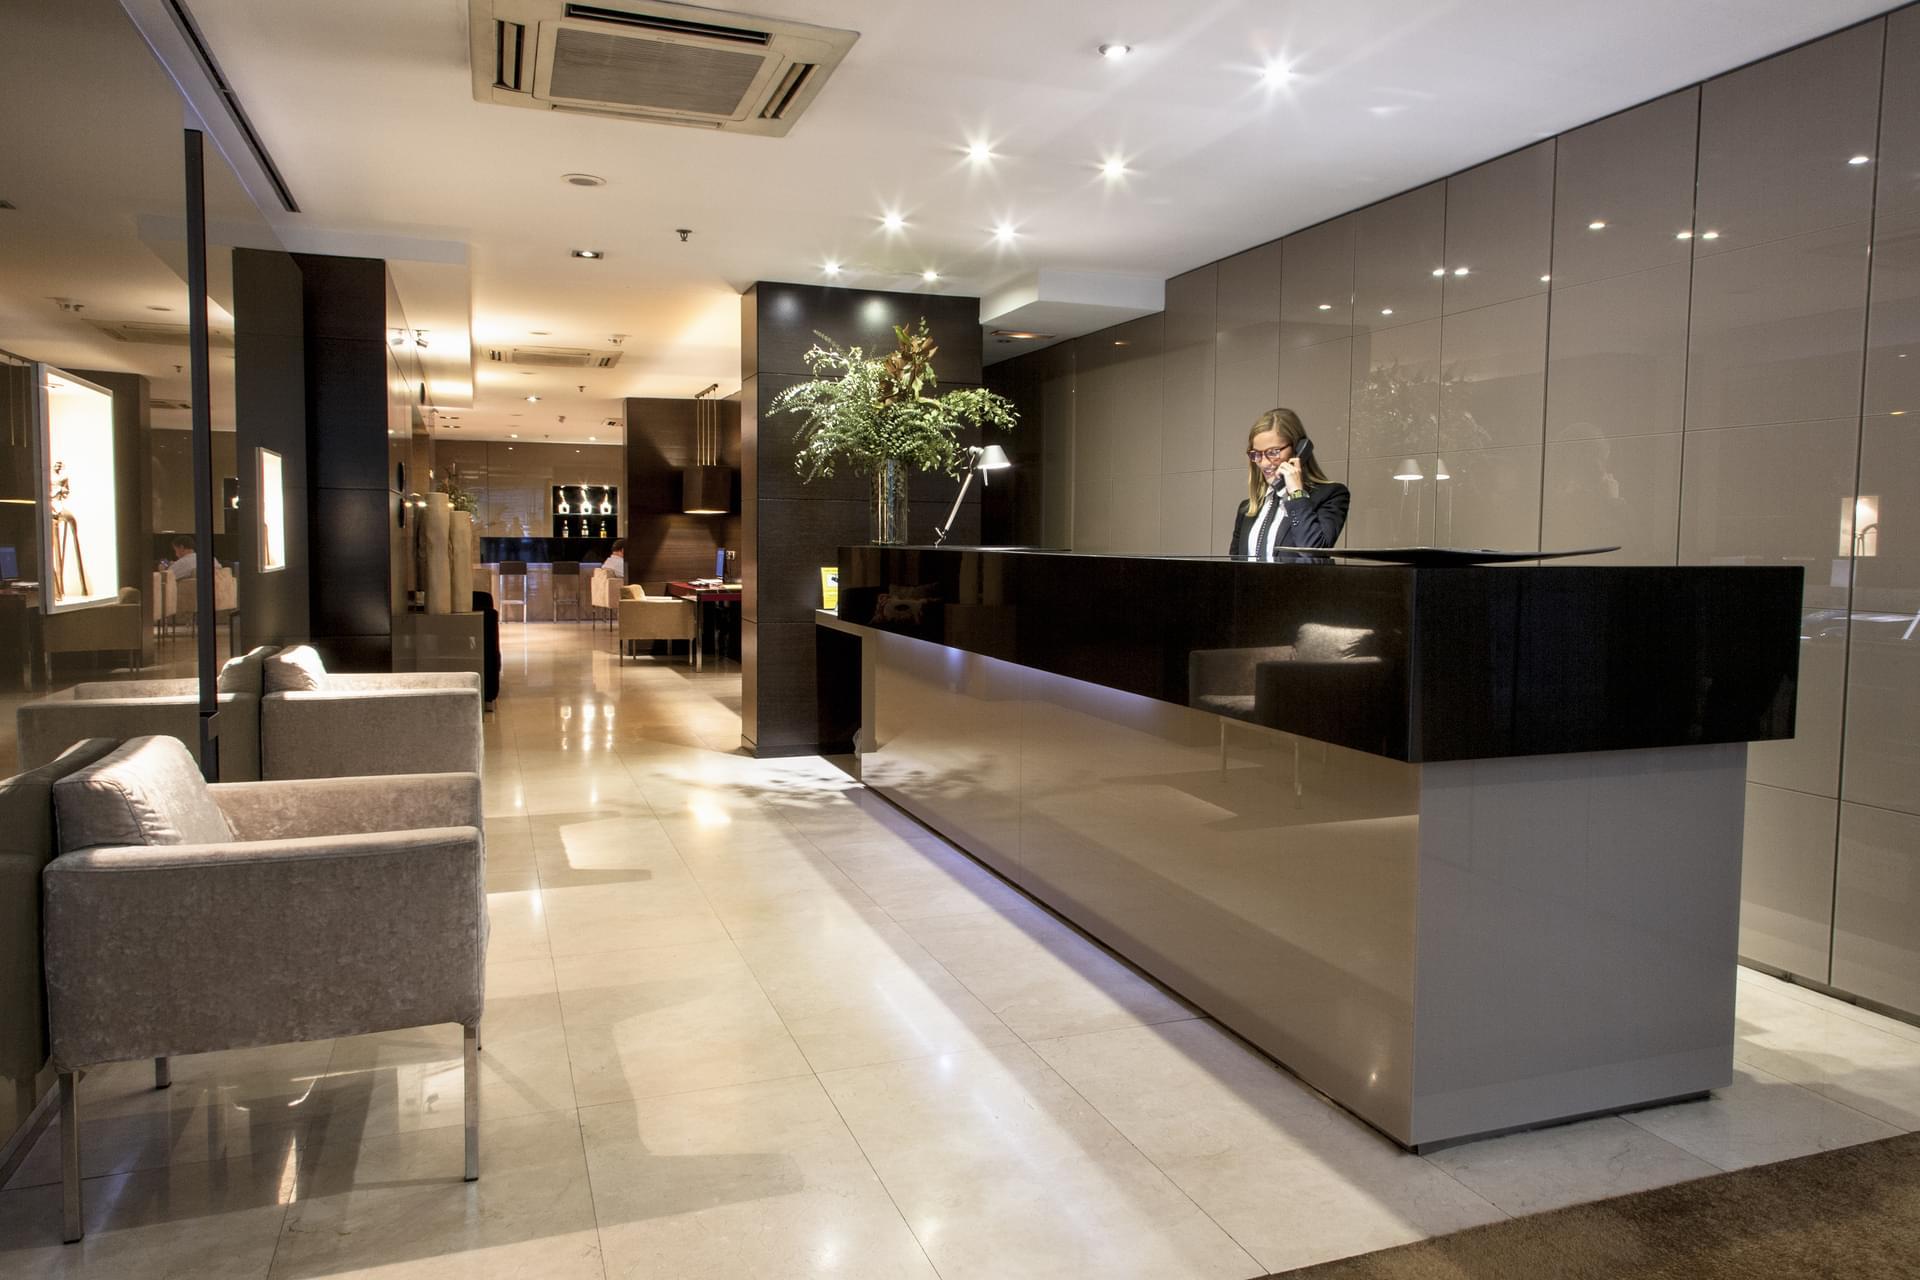 Recepción - Hotel Zenit Barcelona